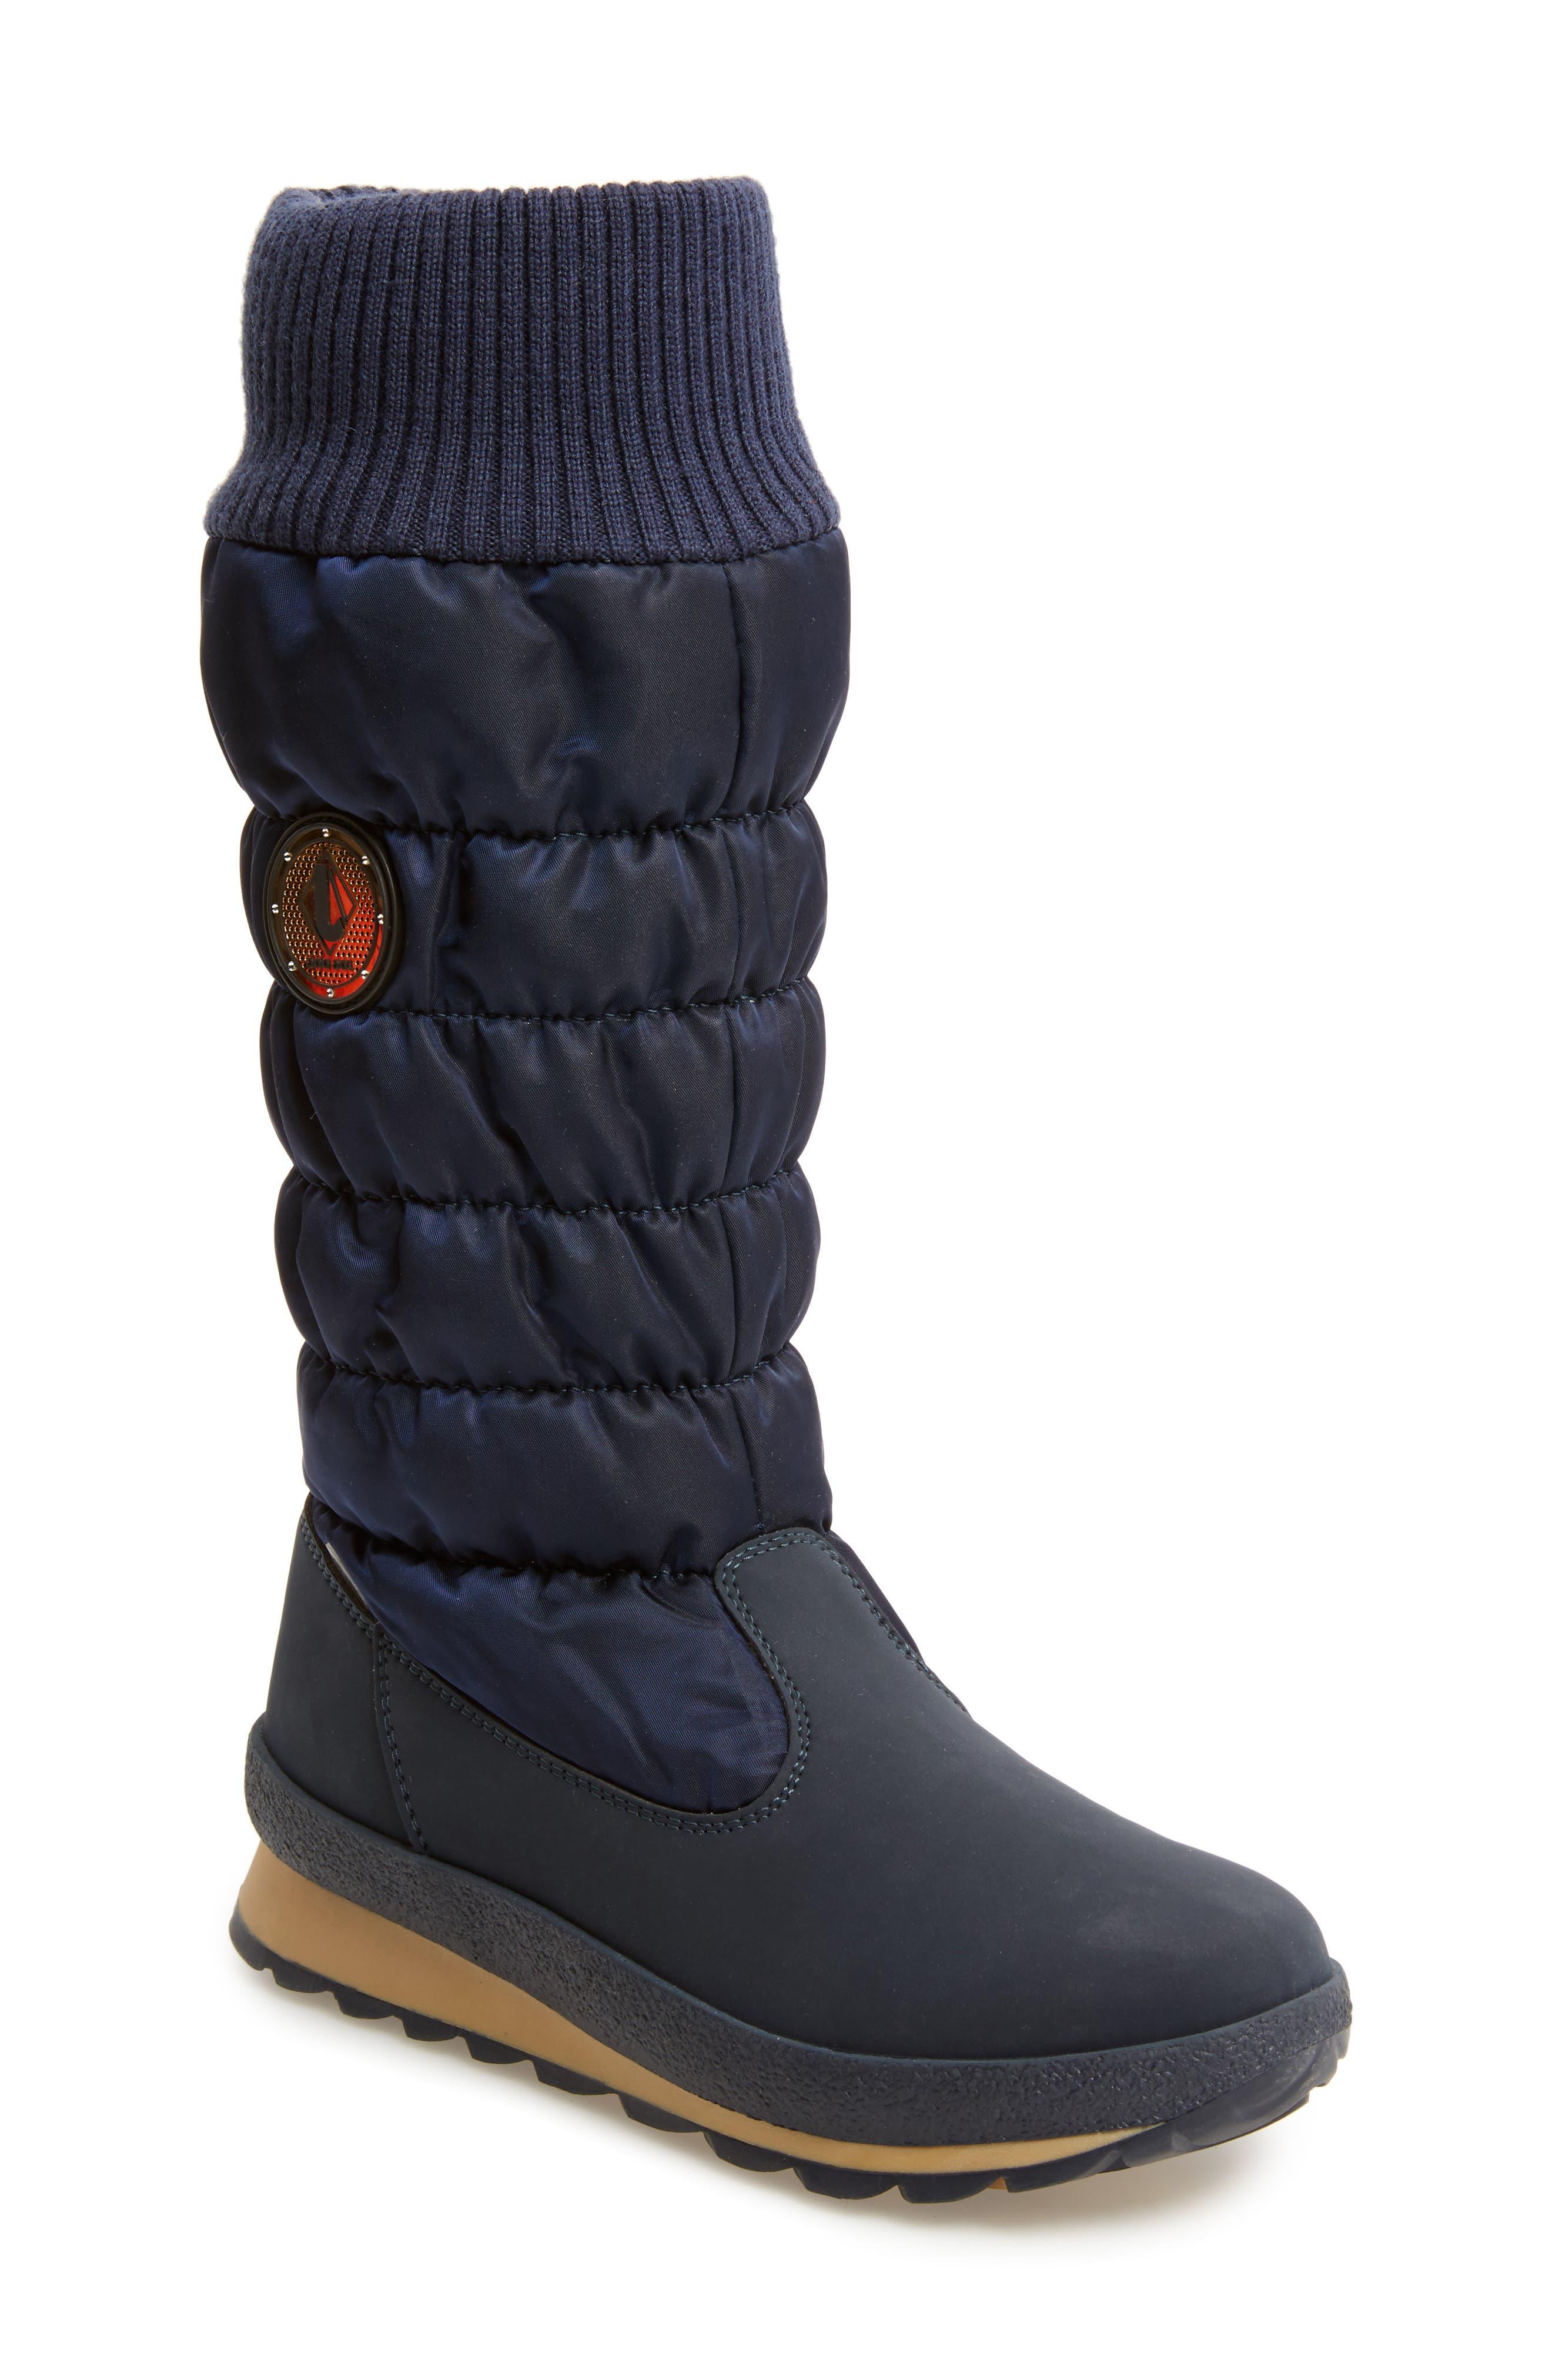 JOG DOG St. Anton Waterproof Winter Boot (Women)